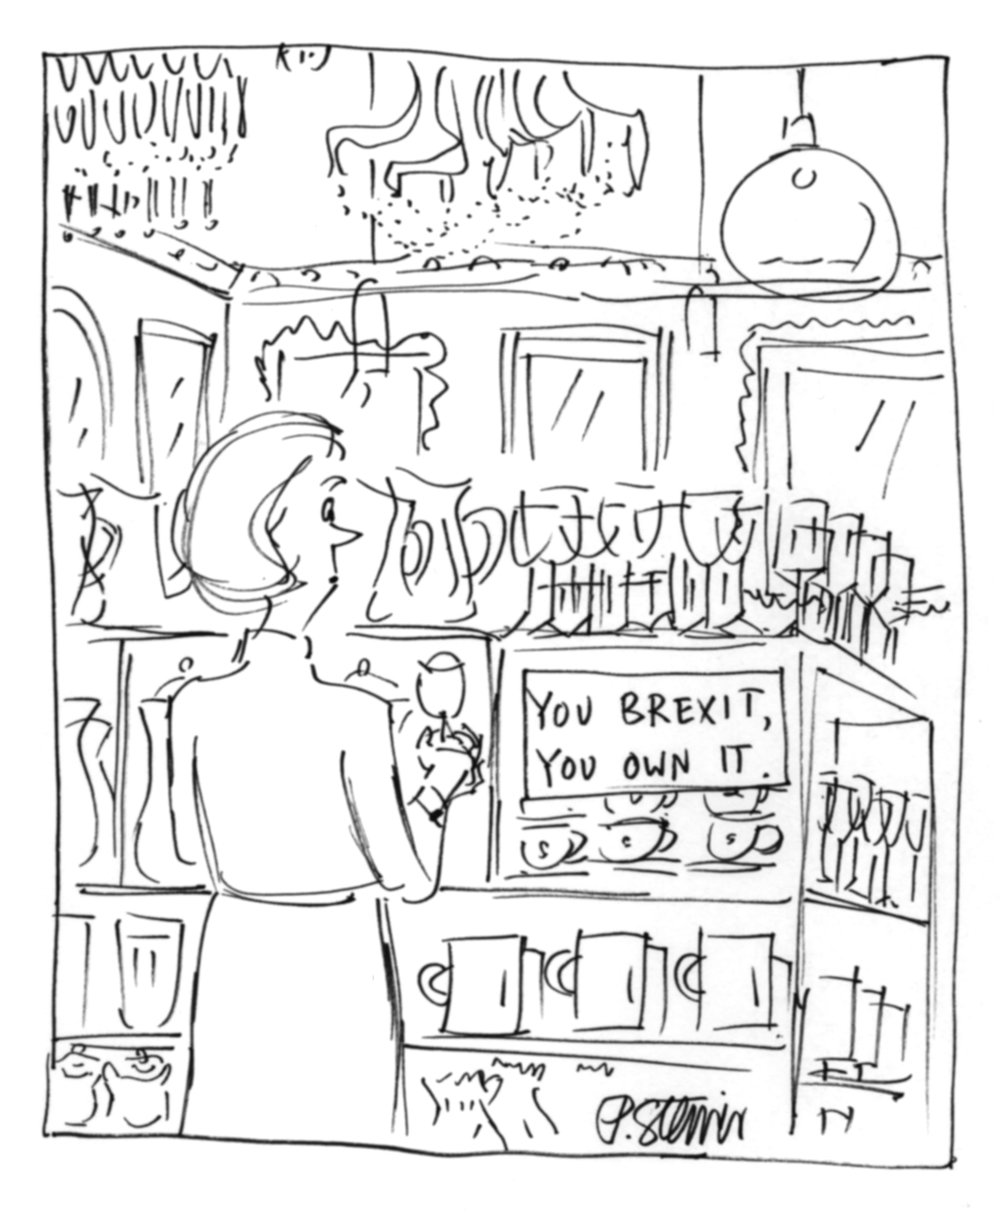 2019-2-4 Brexit.jpg